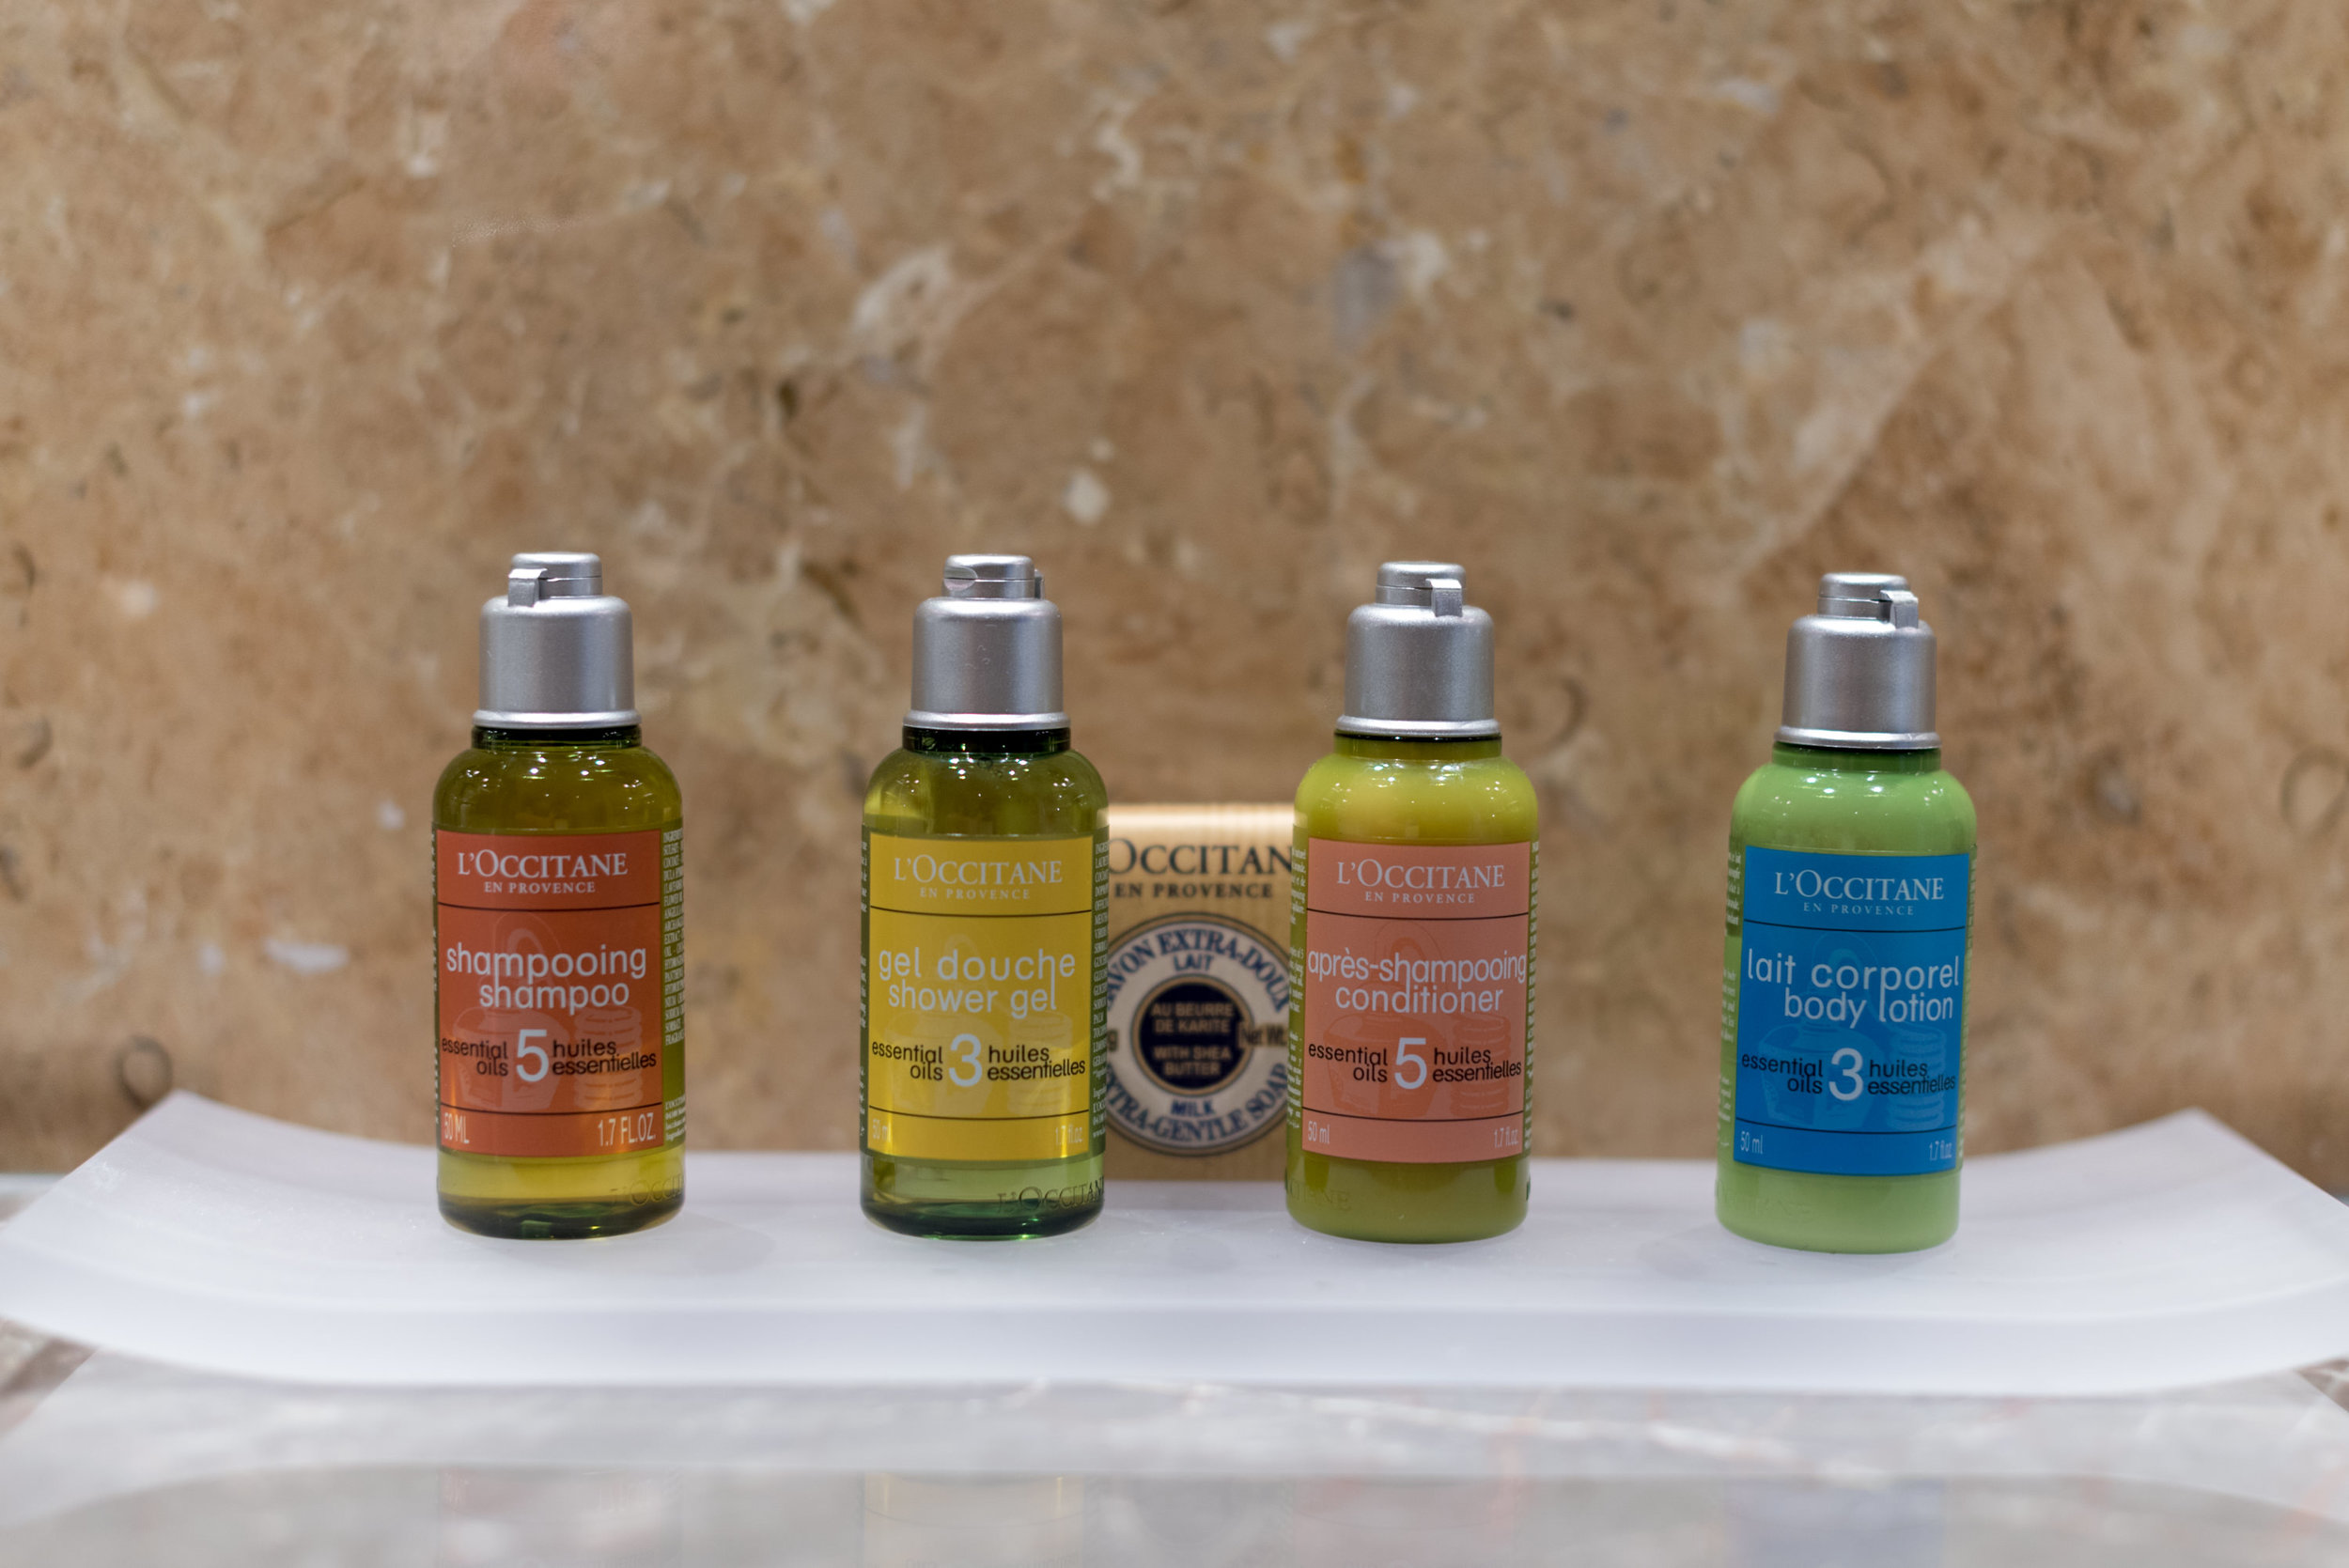 Bath Amenities from L'Occitane en Provence  Four Seasons Executive Suite - Four Seasons Hotel Singapore